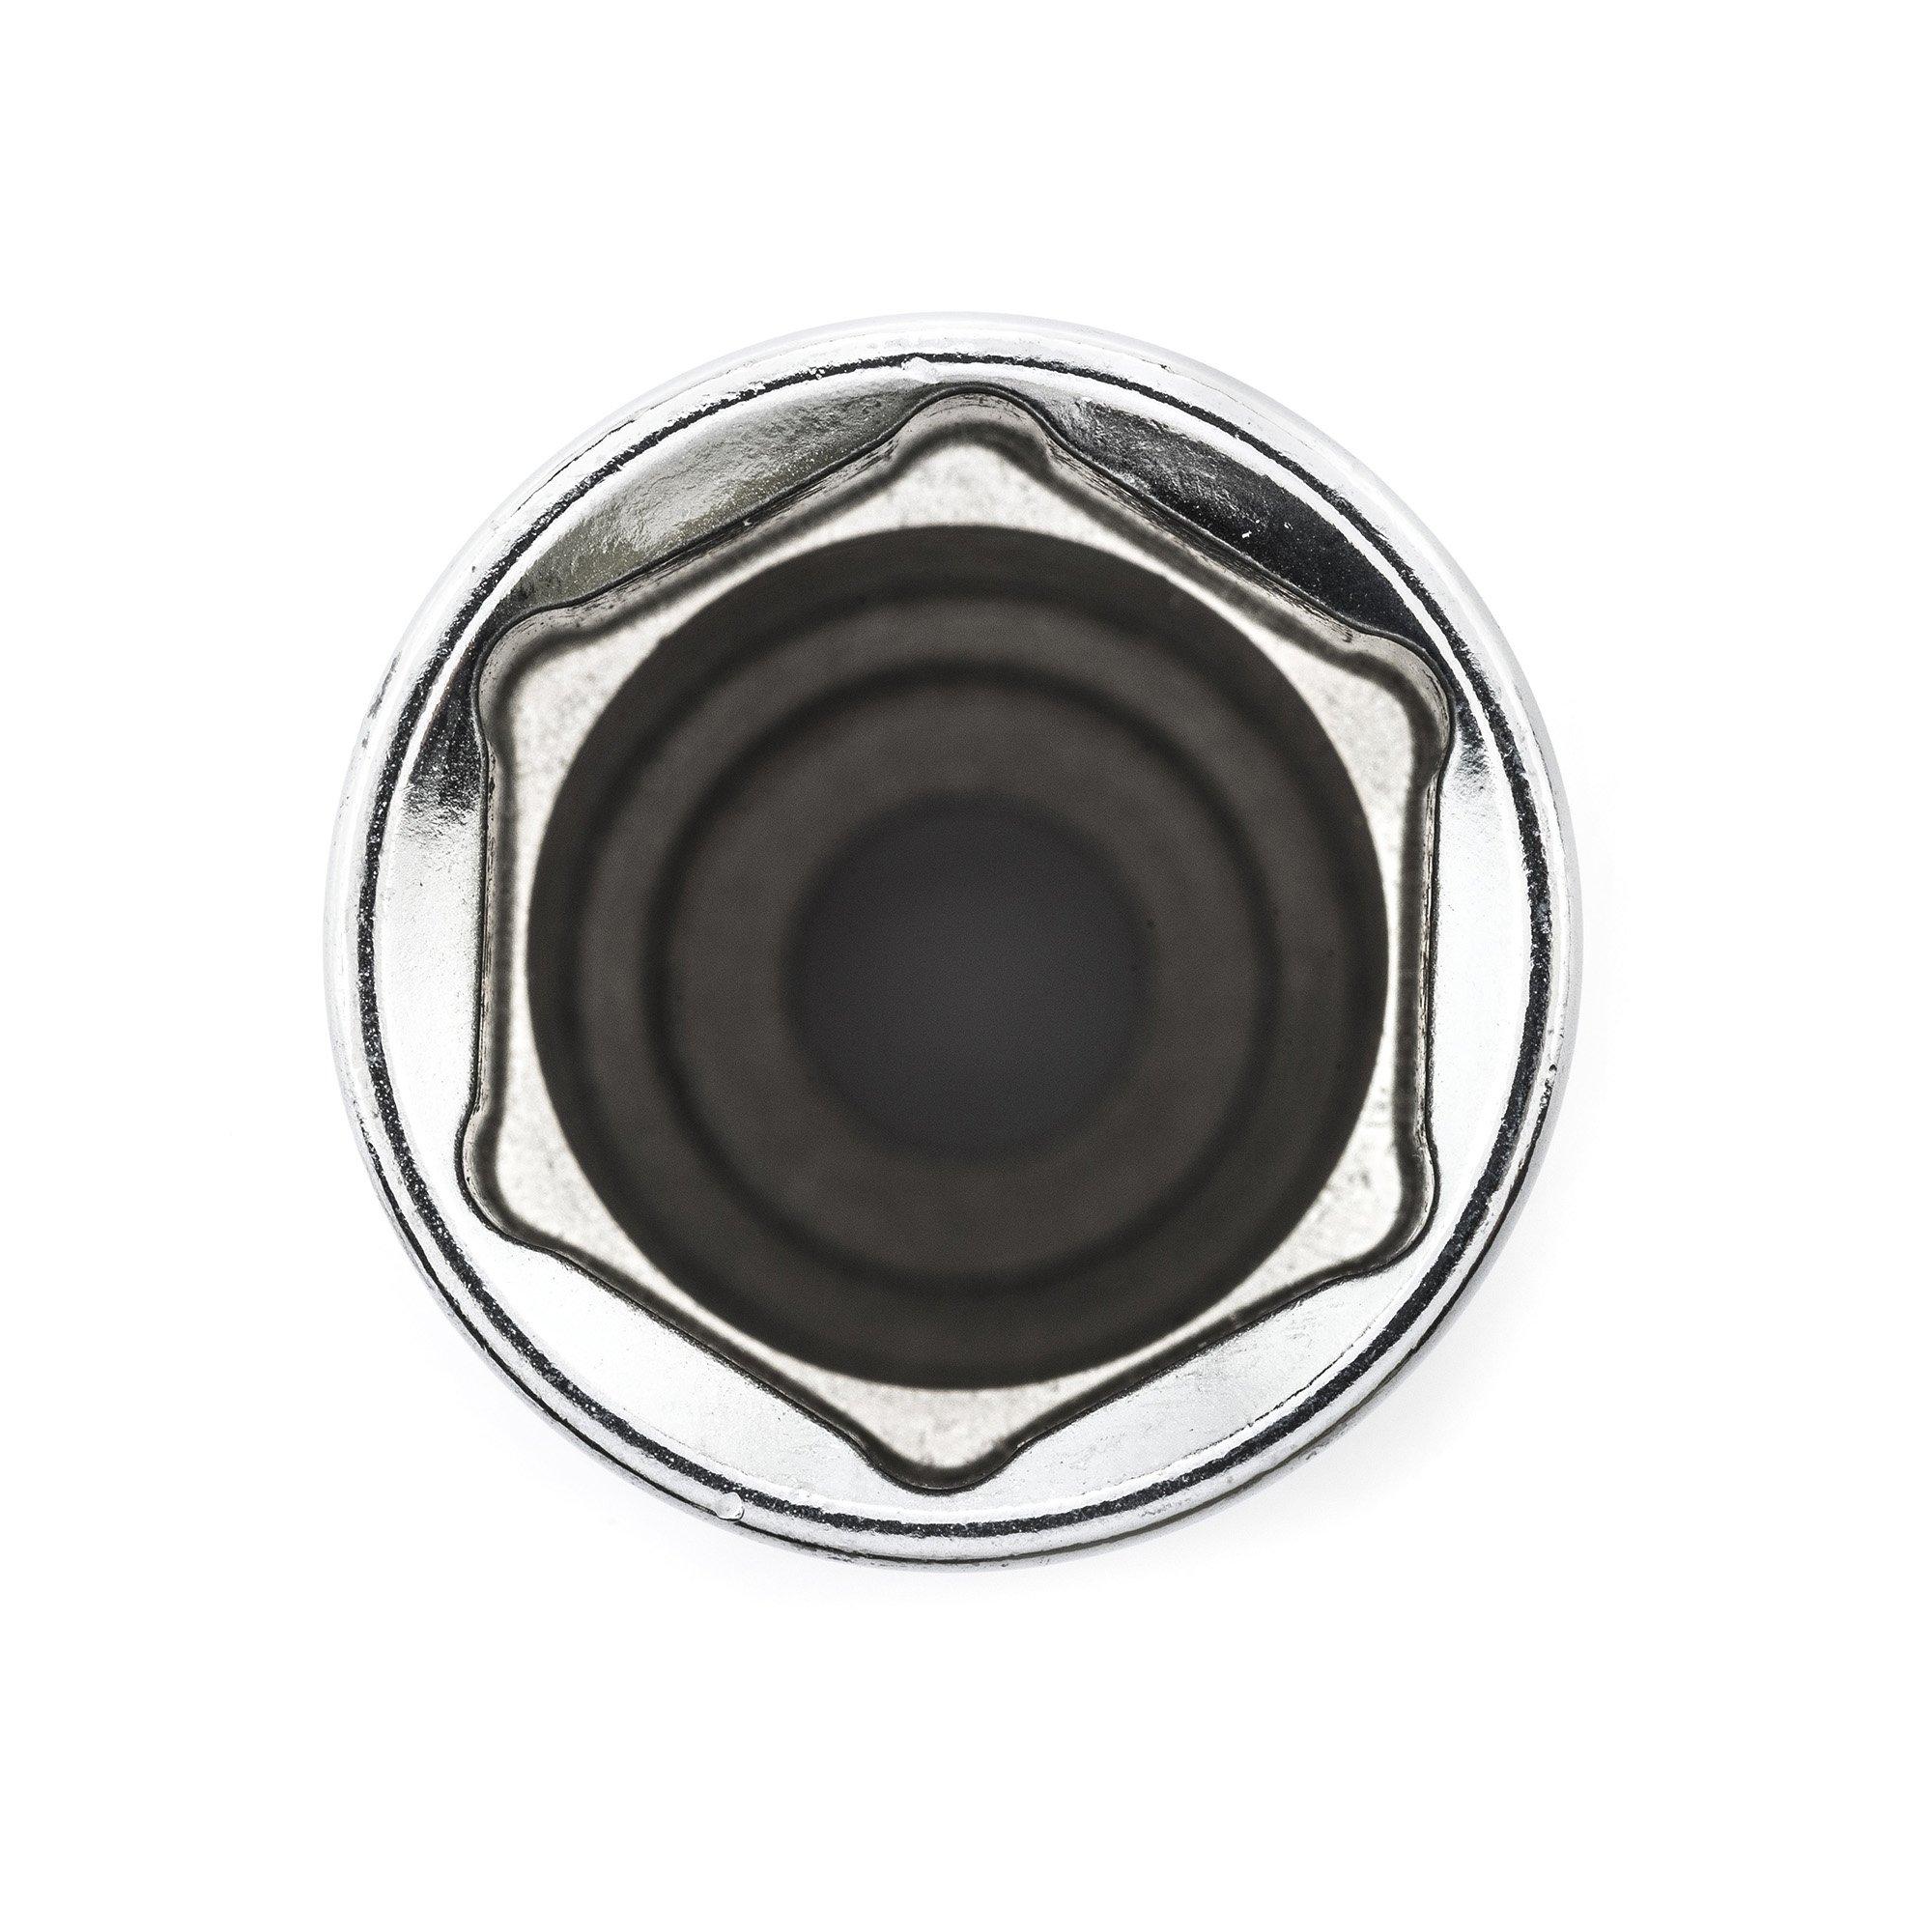 GearWrench 80554 14 Piece 3/8-Inch Drive 6 Point Deep Metric Socket Set